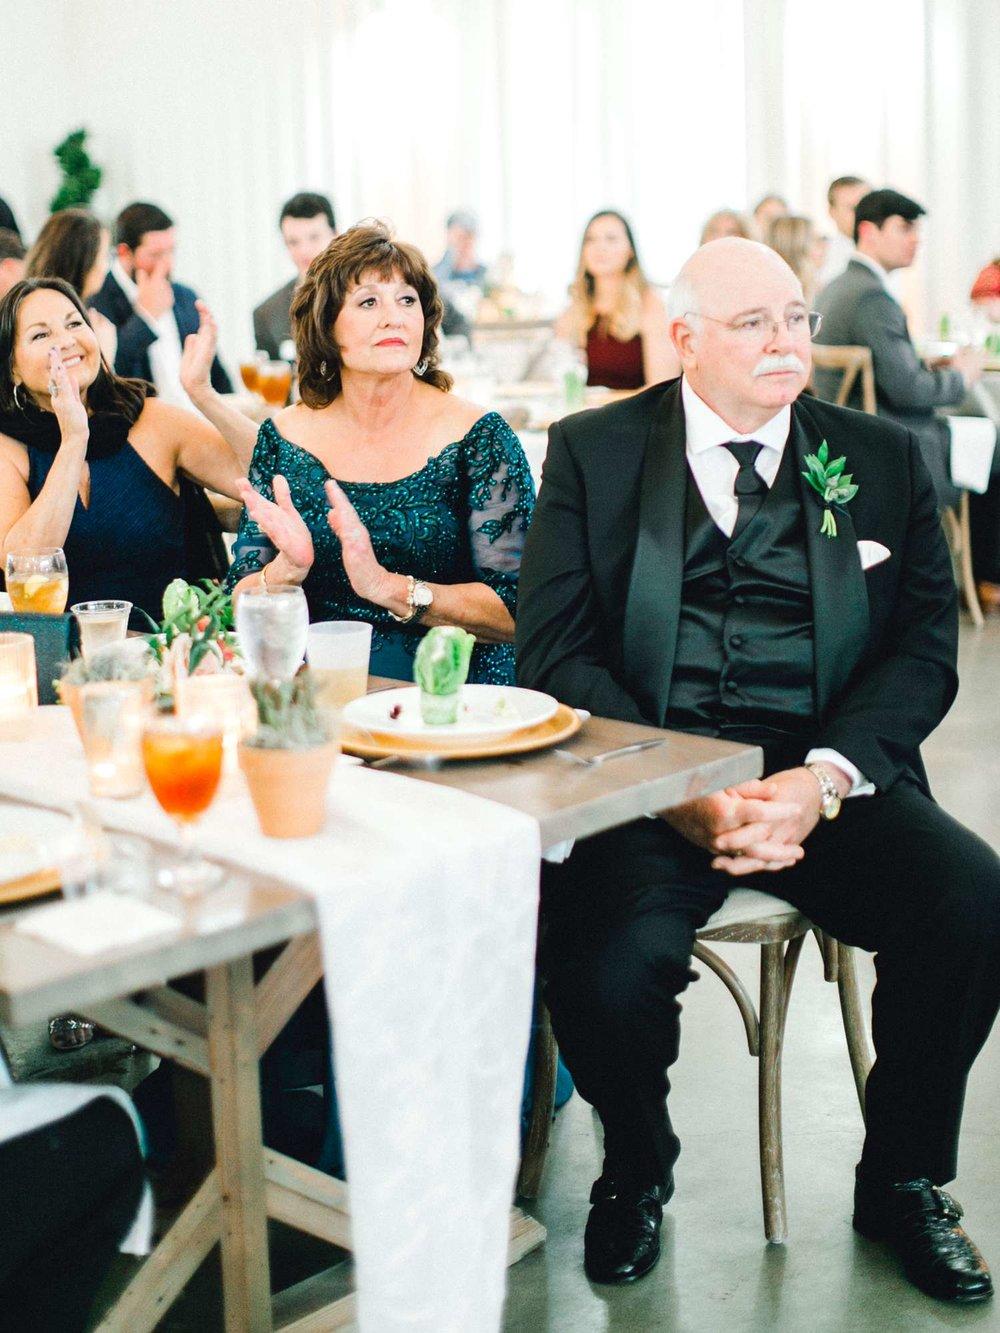 HEBERT_MORGAN_AND_CLAY_ALLEEJ_THE_FARMHOUSE_MONTGOMERY_TEXAS_WEDDING_0185.jpg